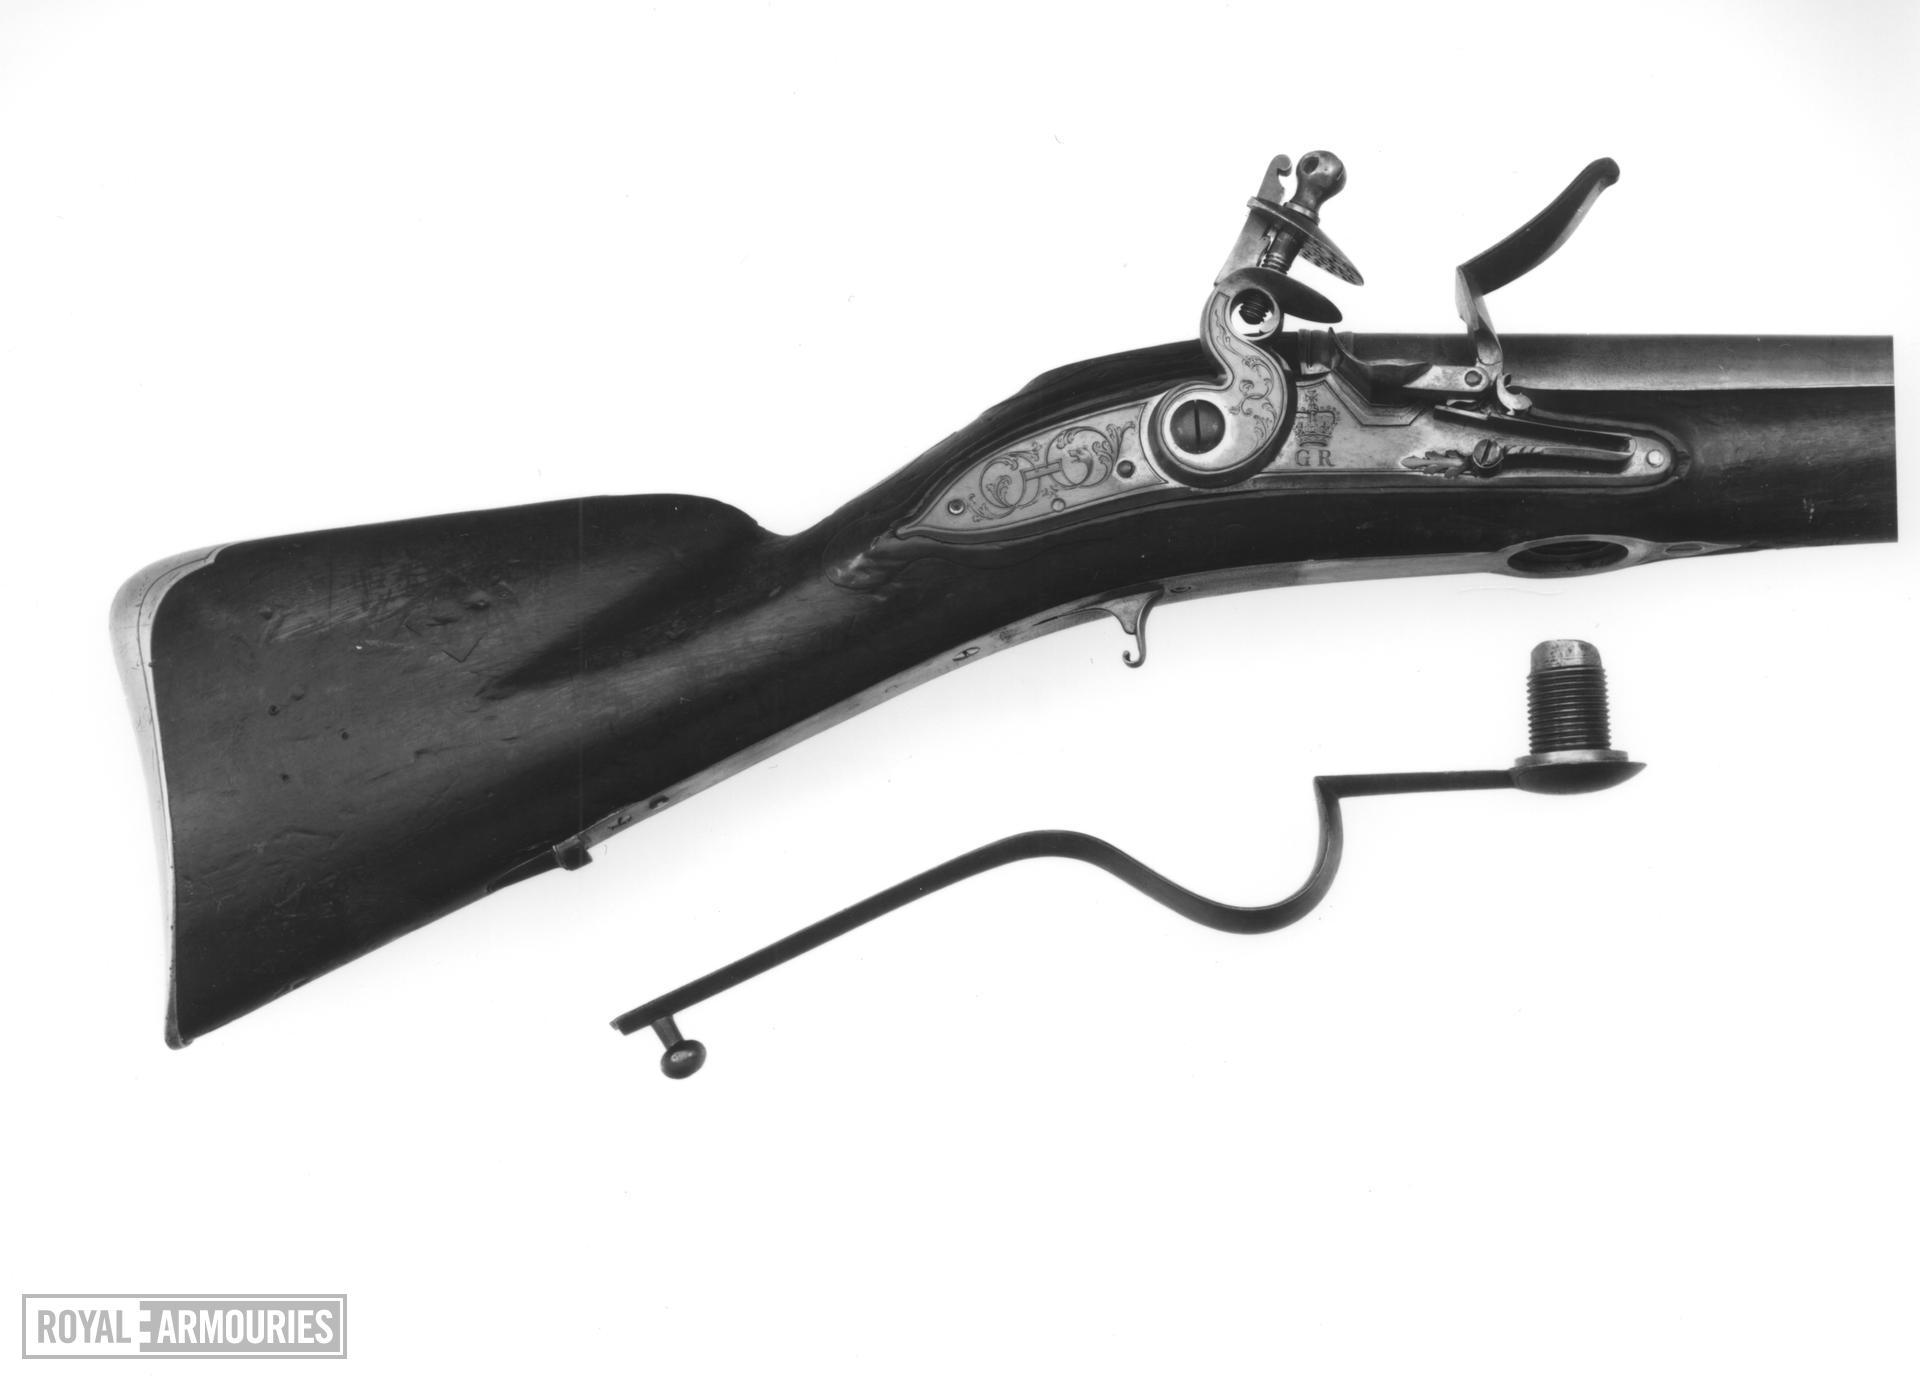 Flintlock breech-loading military wall gun - N/A Rifled